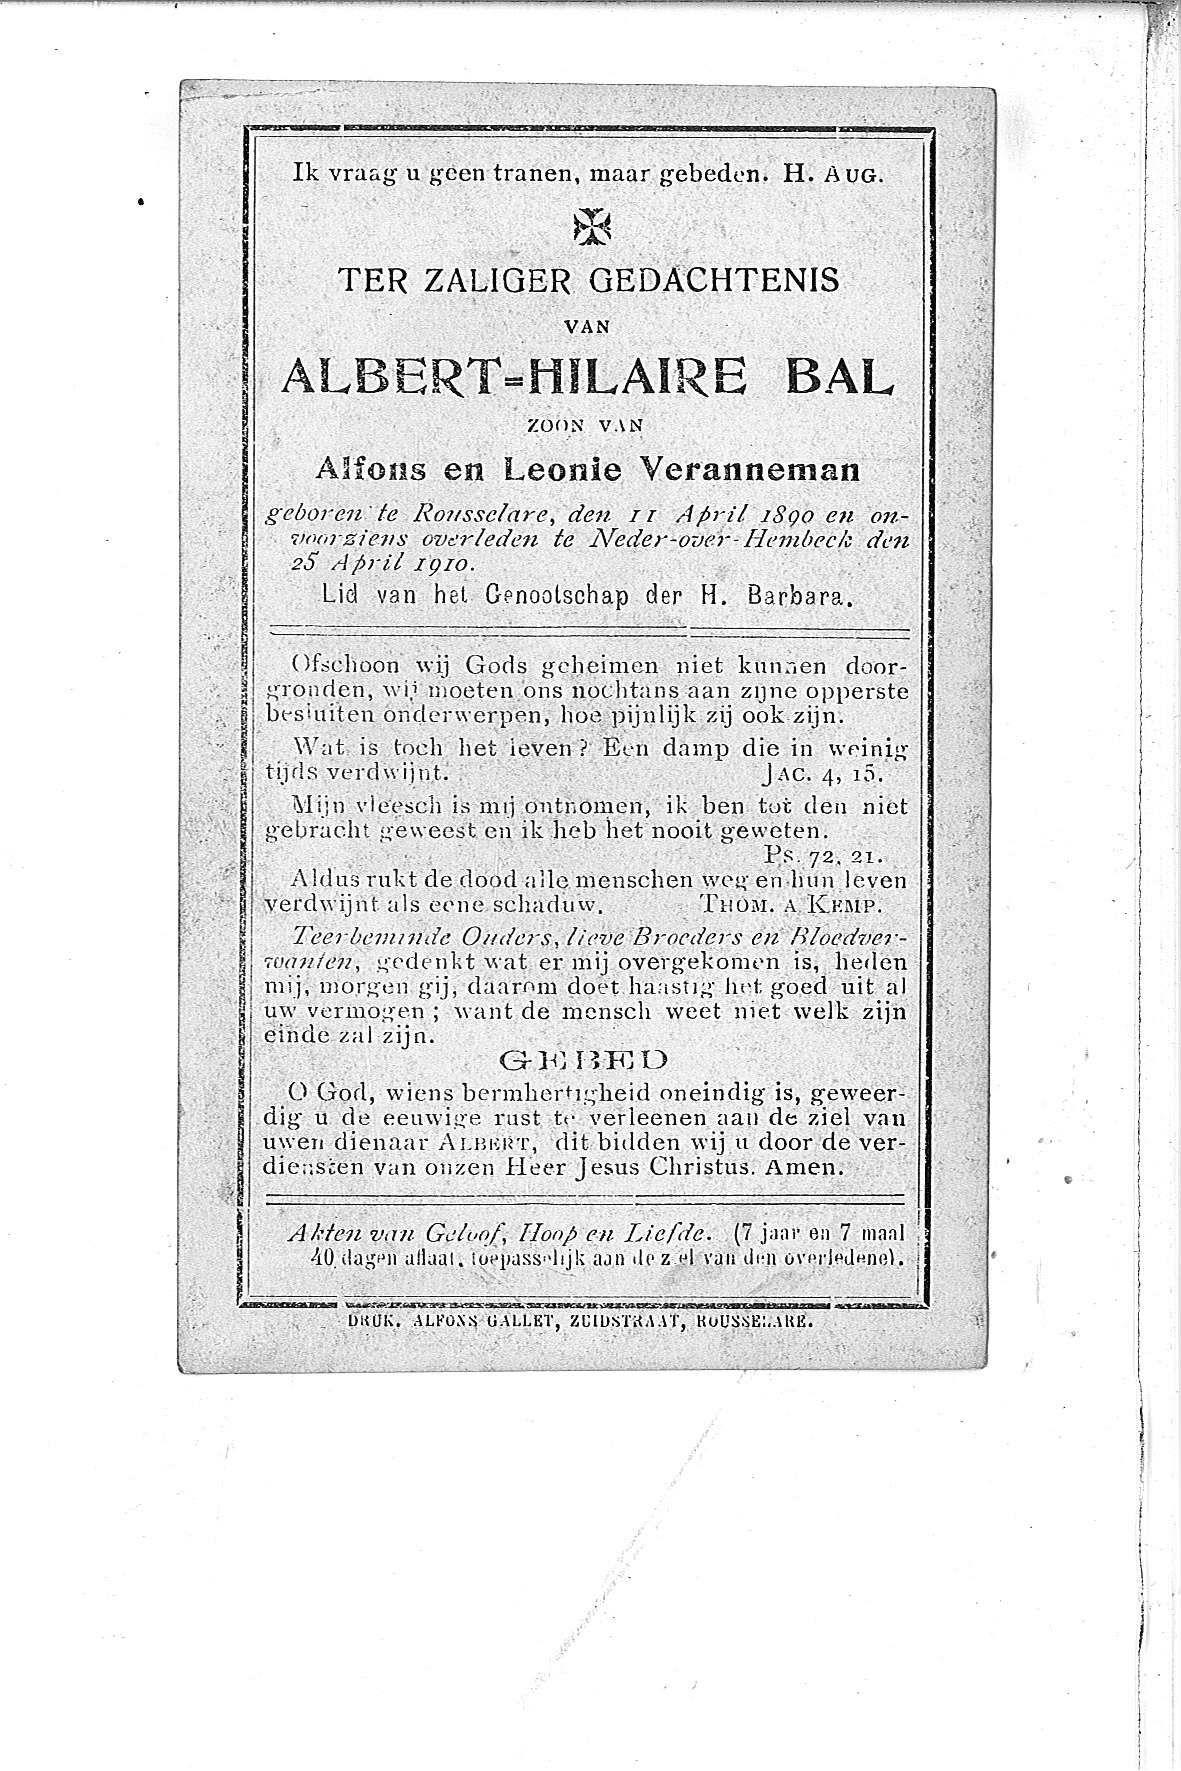 Albert-Hilaire(1910)20101006133005_00016.jpg